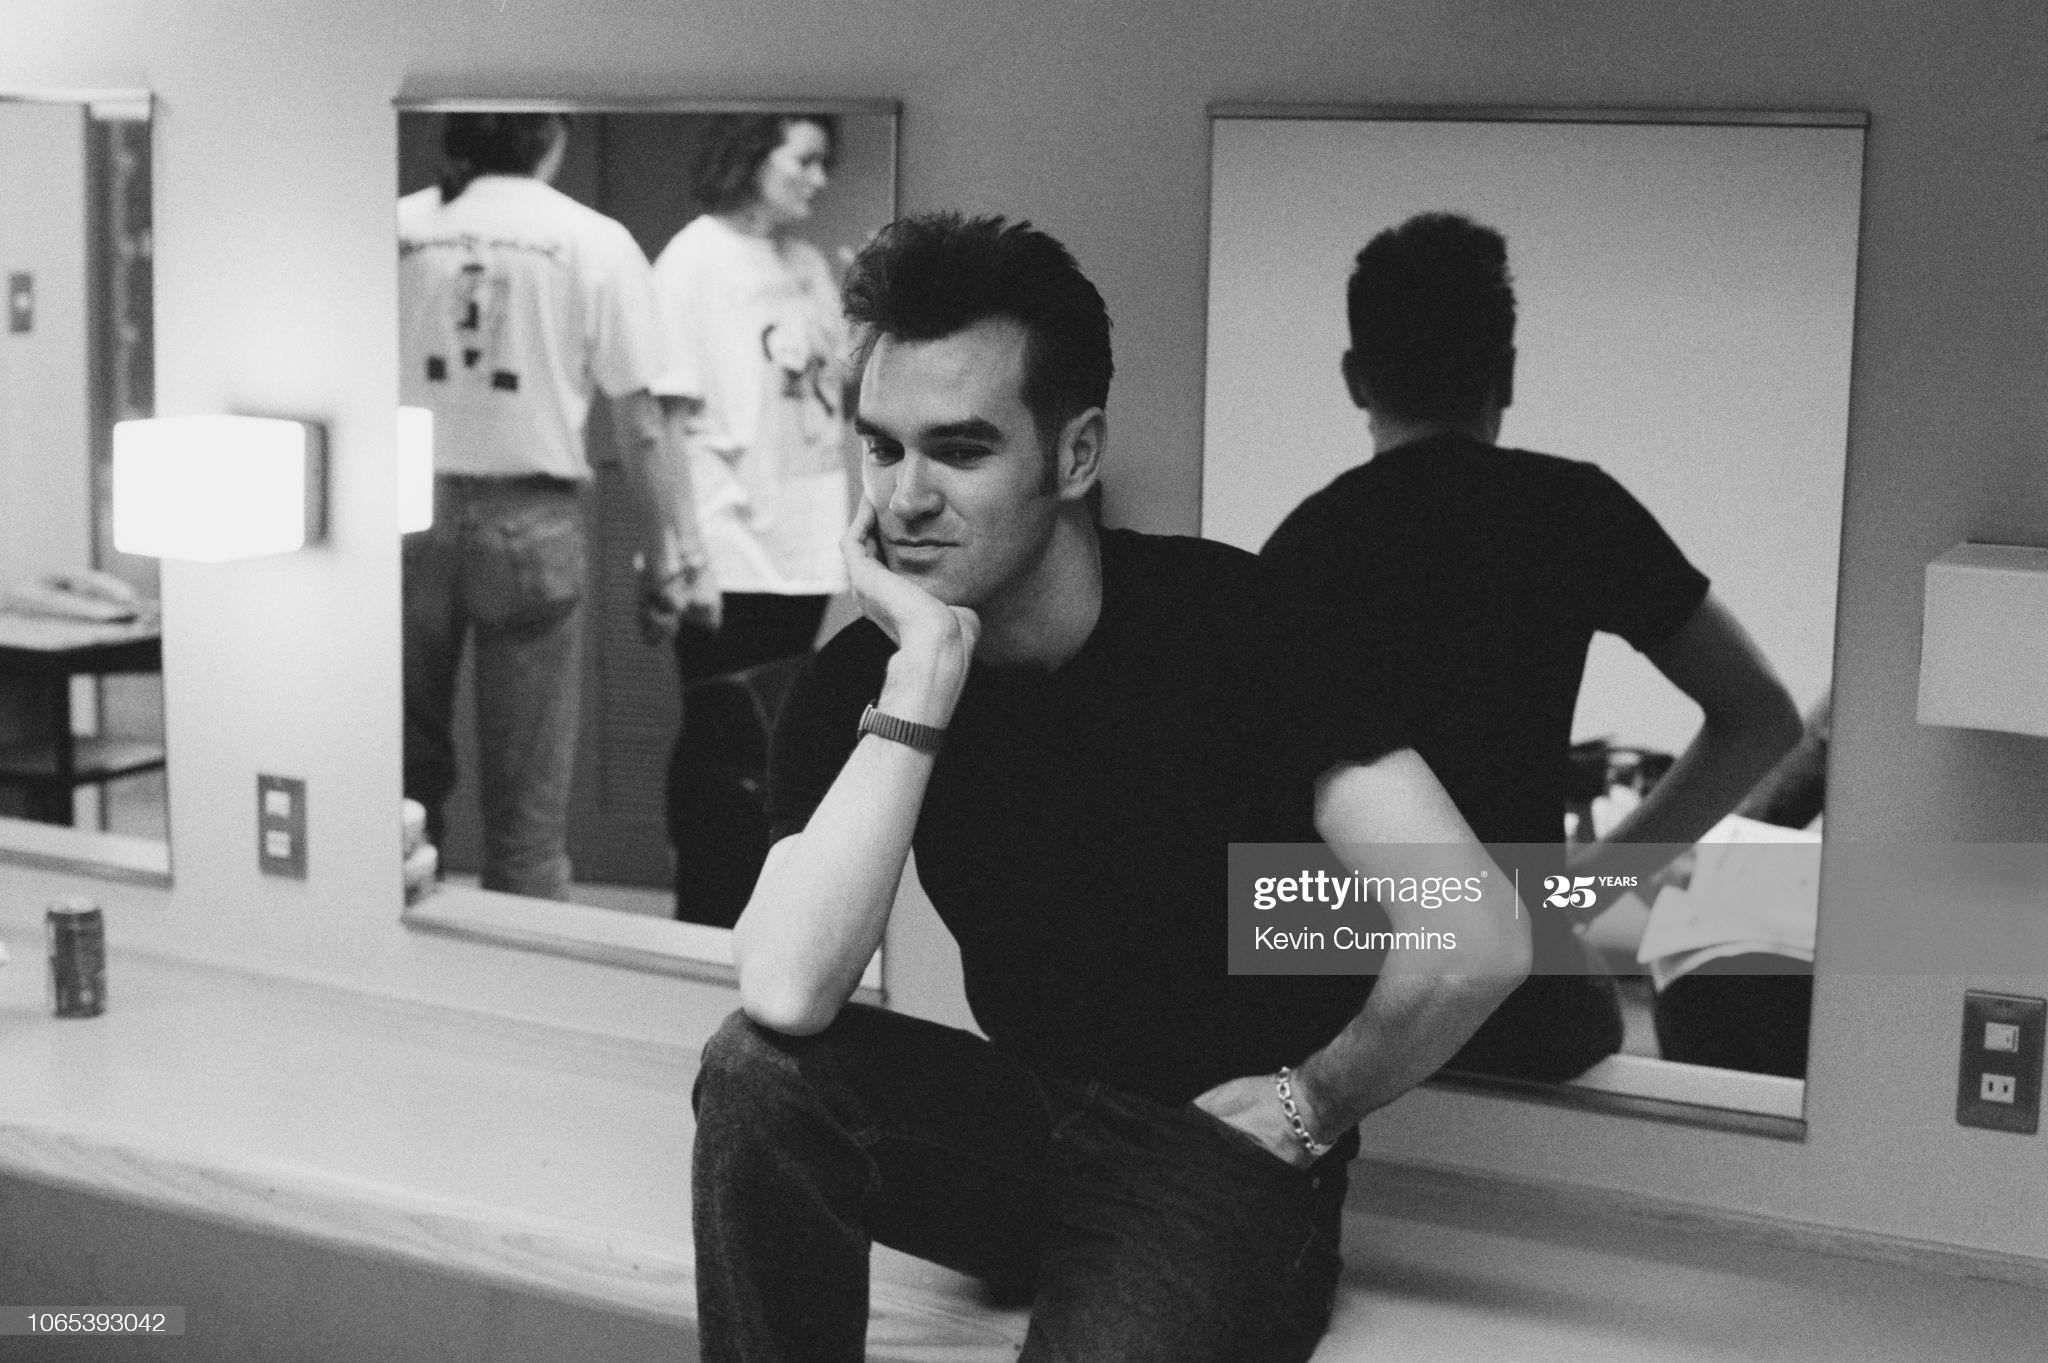 Morrissey ~ Japan September 5th 1991 (i) Kevin Cummins.jpg